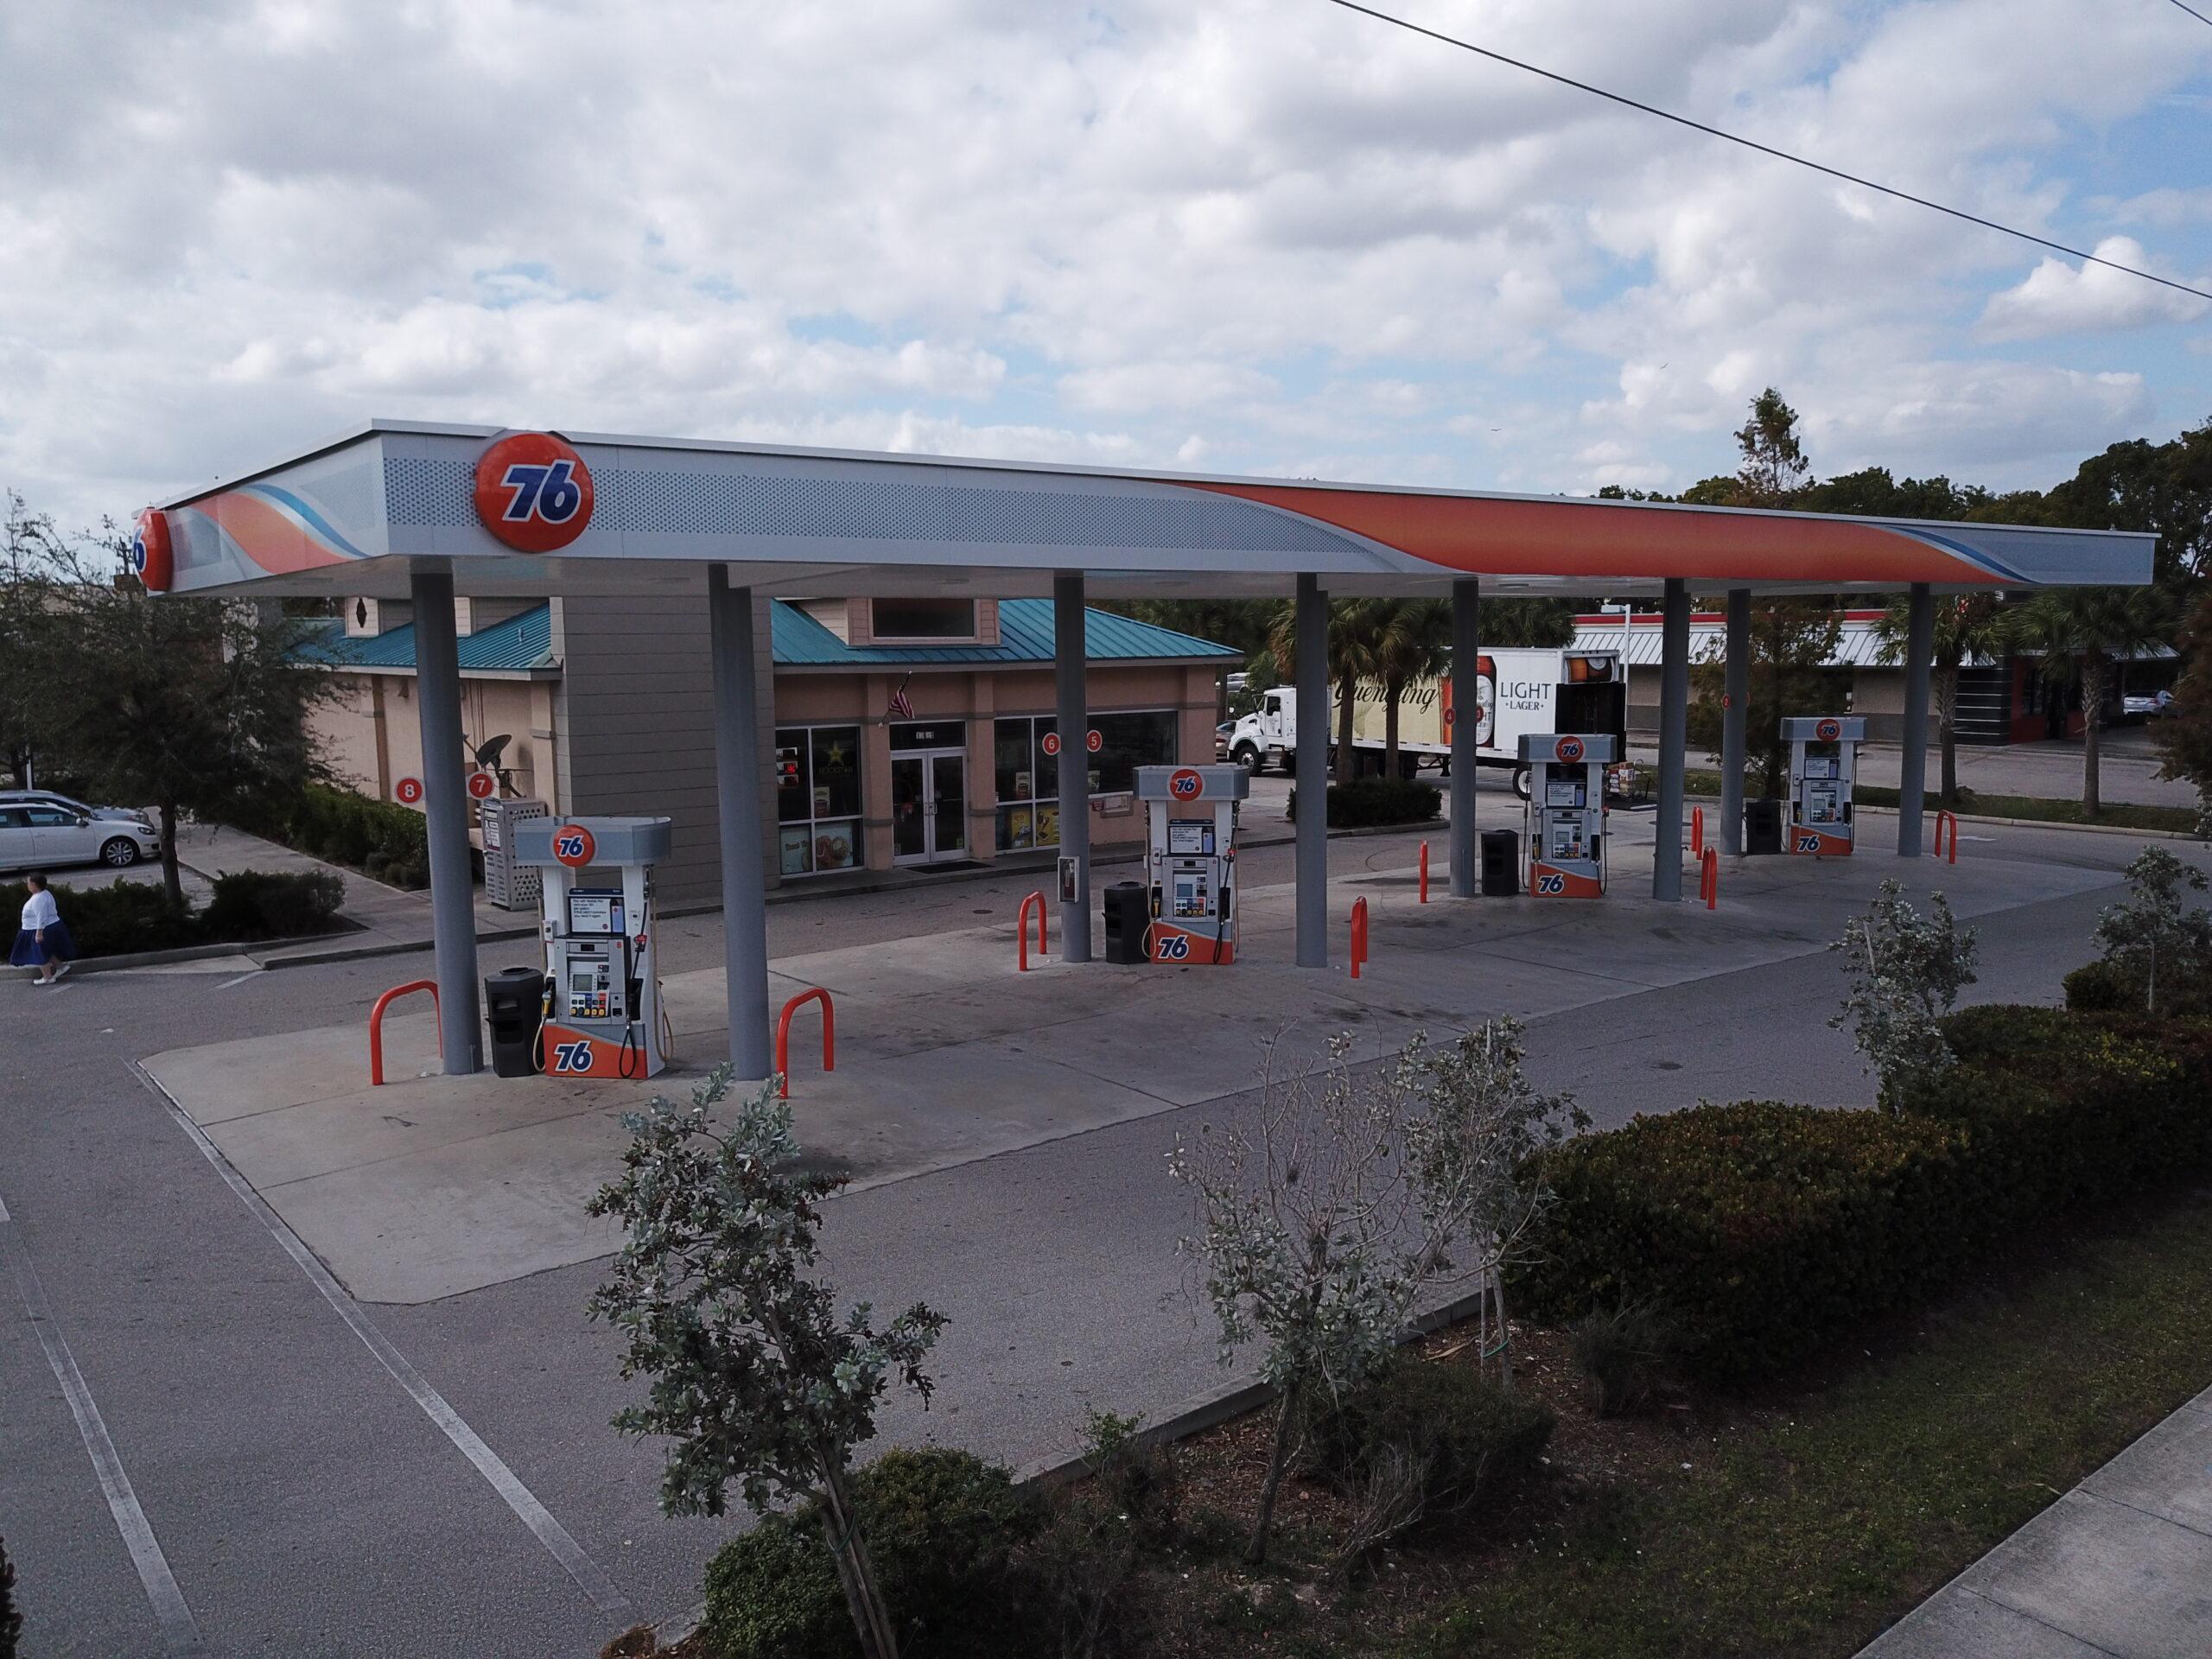 76 Gas Station Fort Myers, FL (Cleveland)